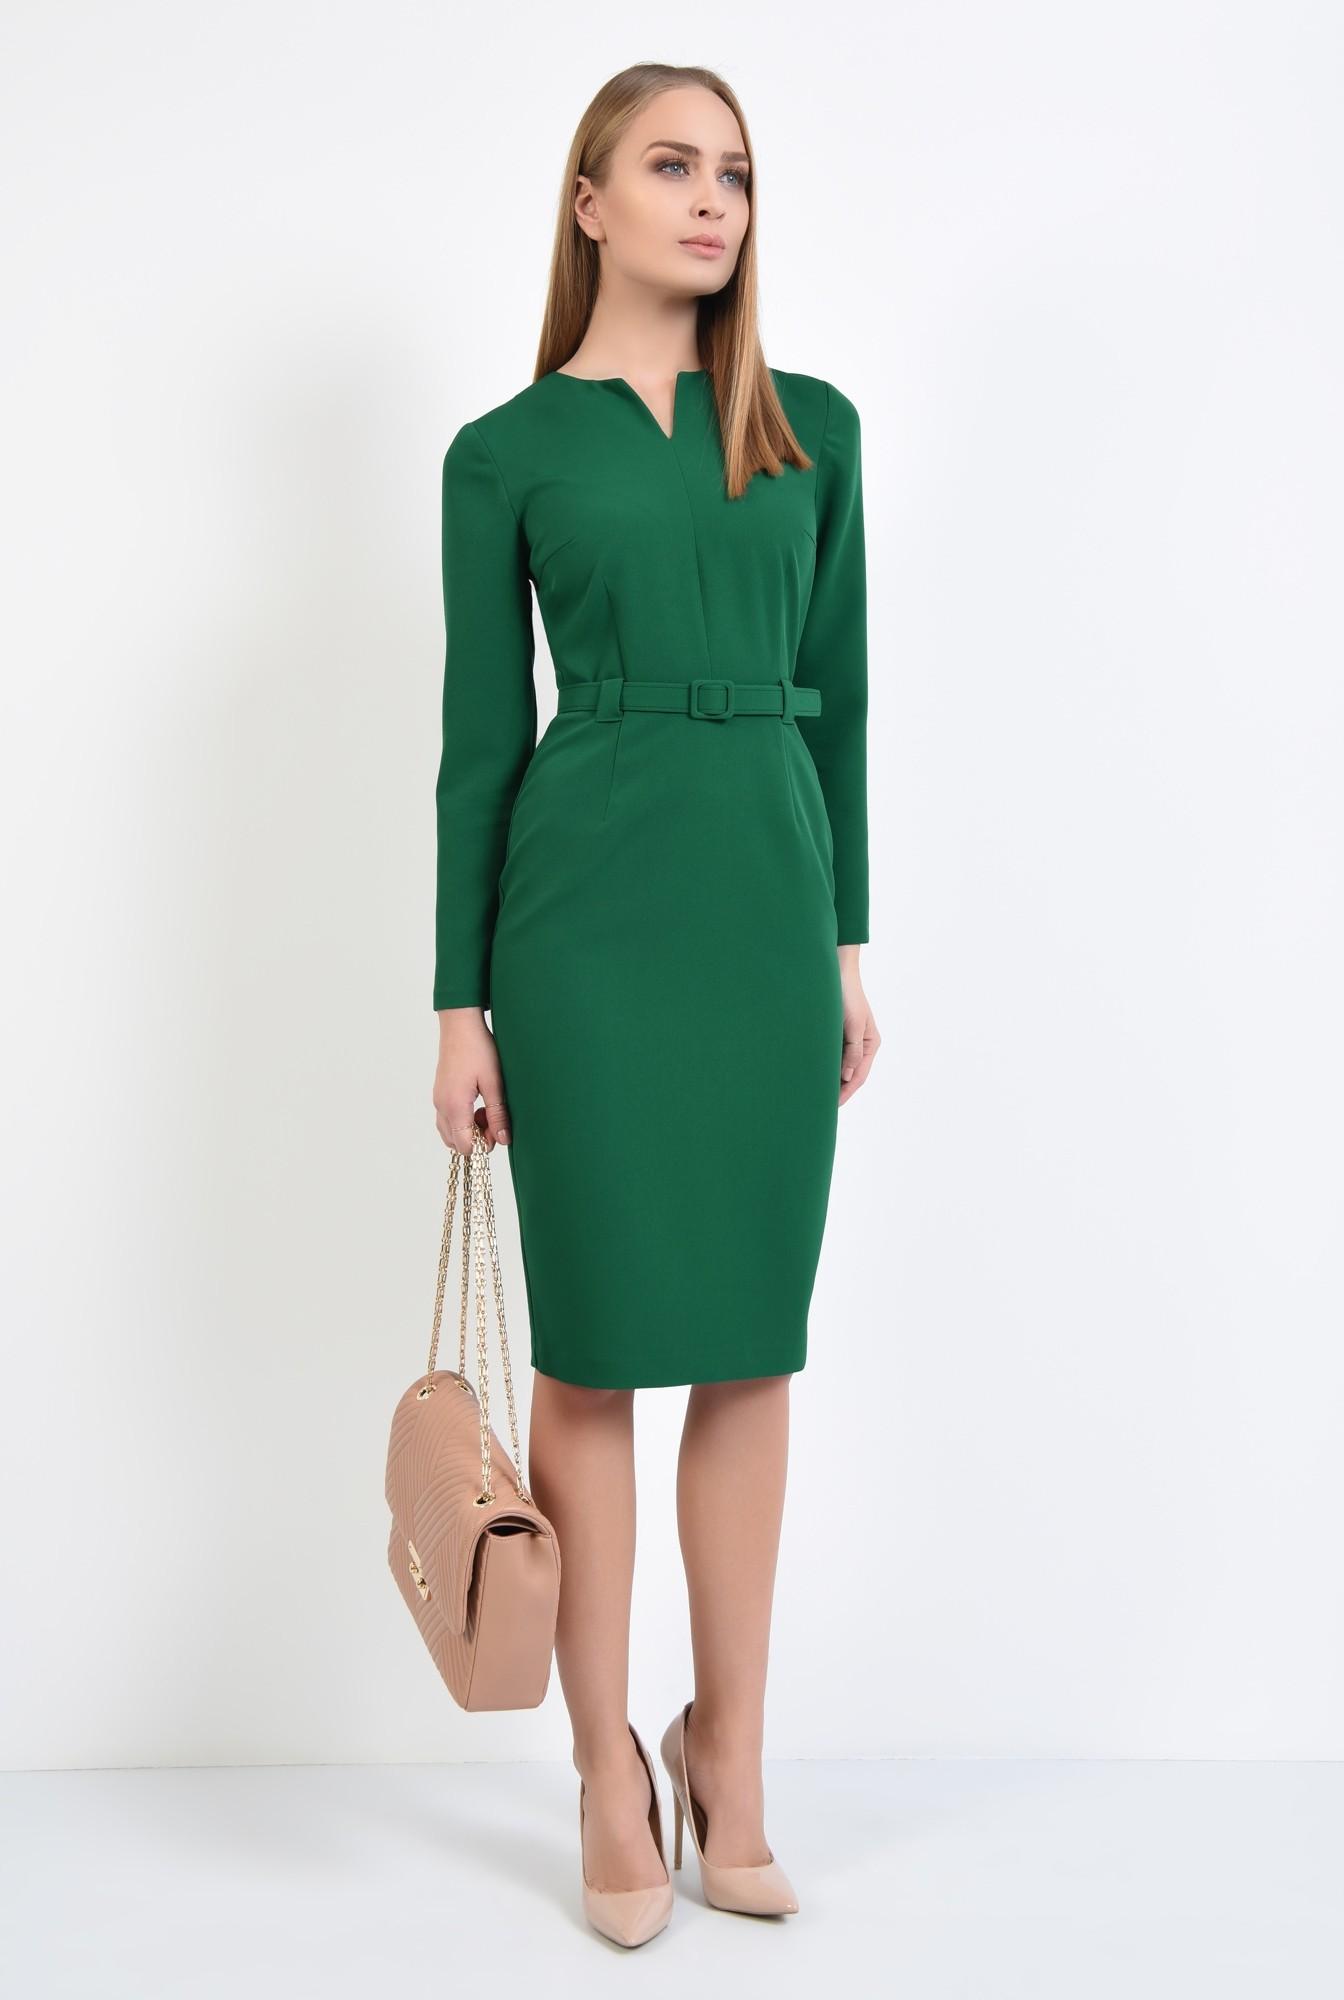 3 - rochie casual, midi, maneci lungi, centura ingusta, verde